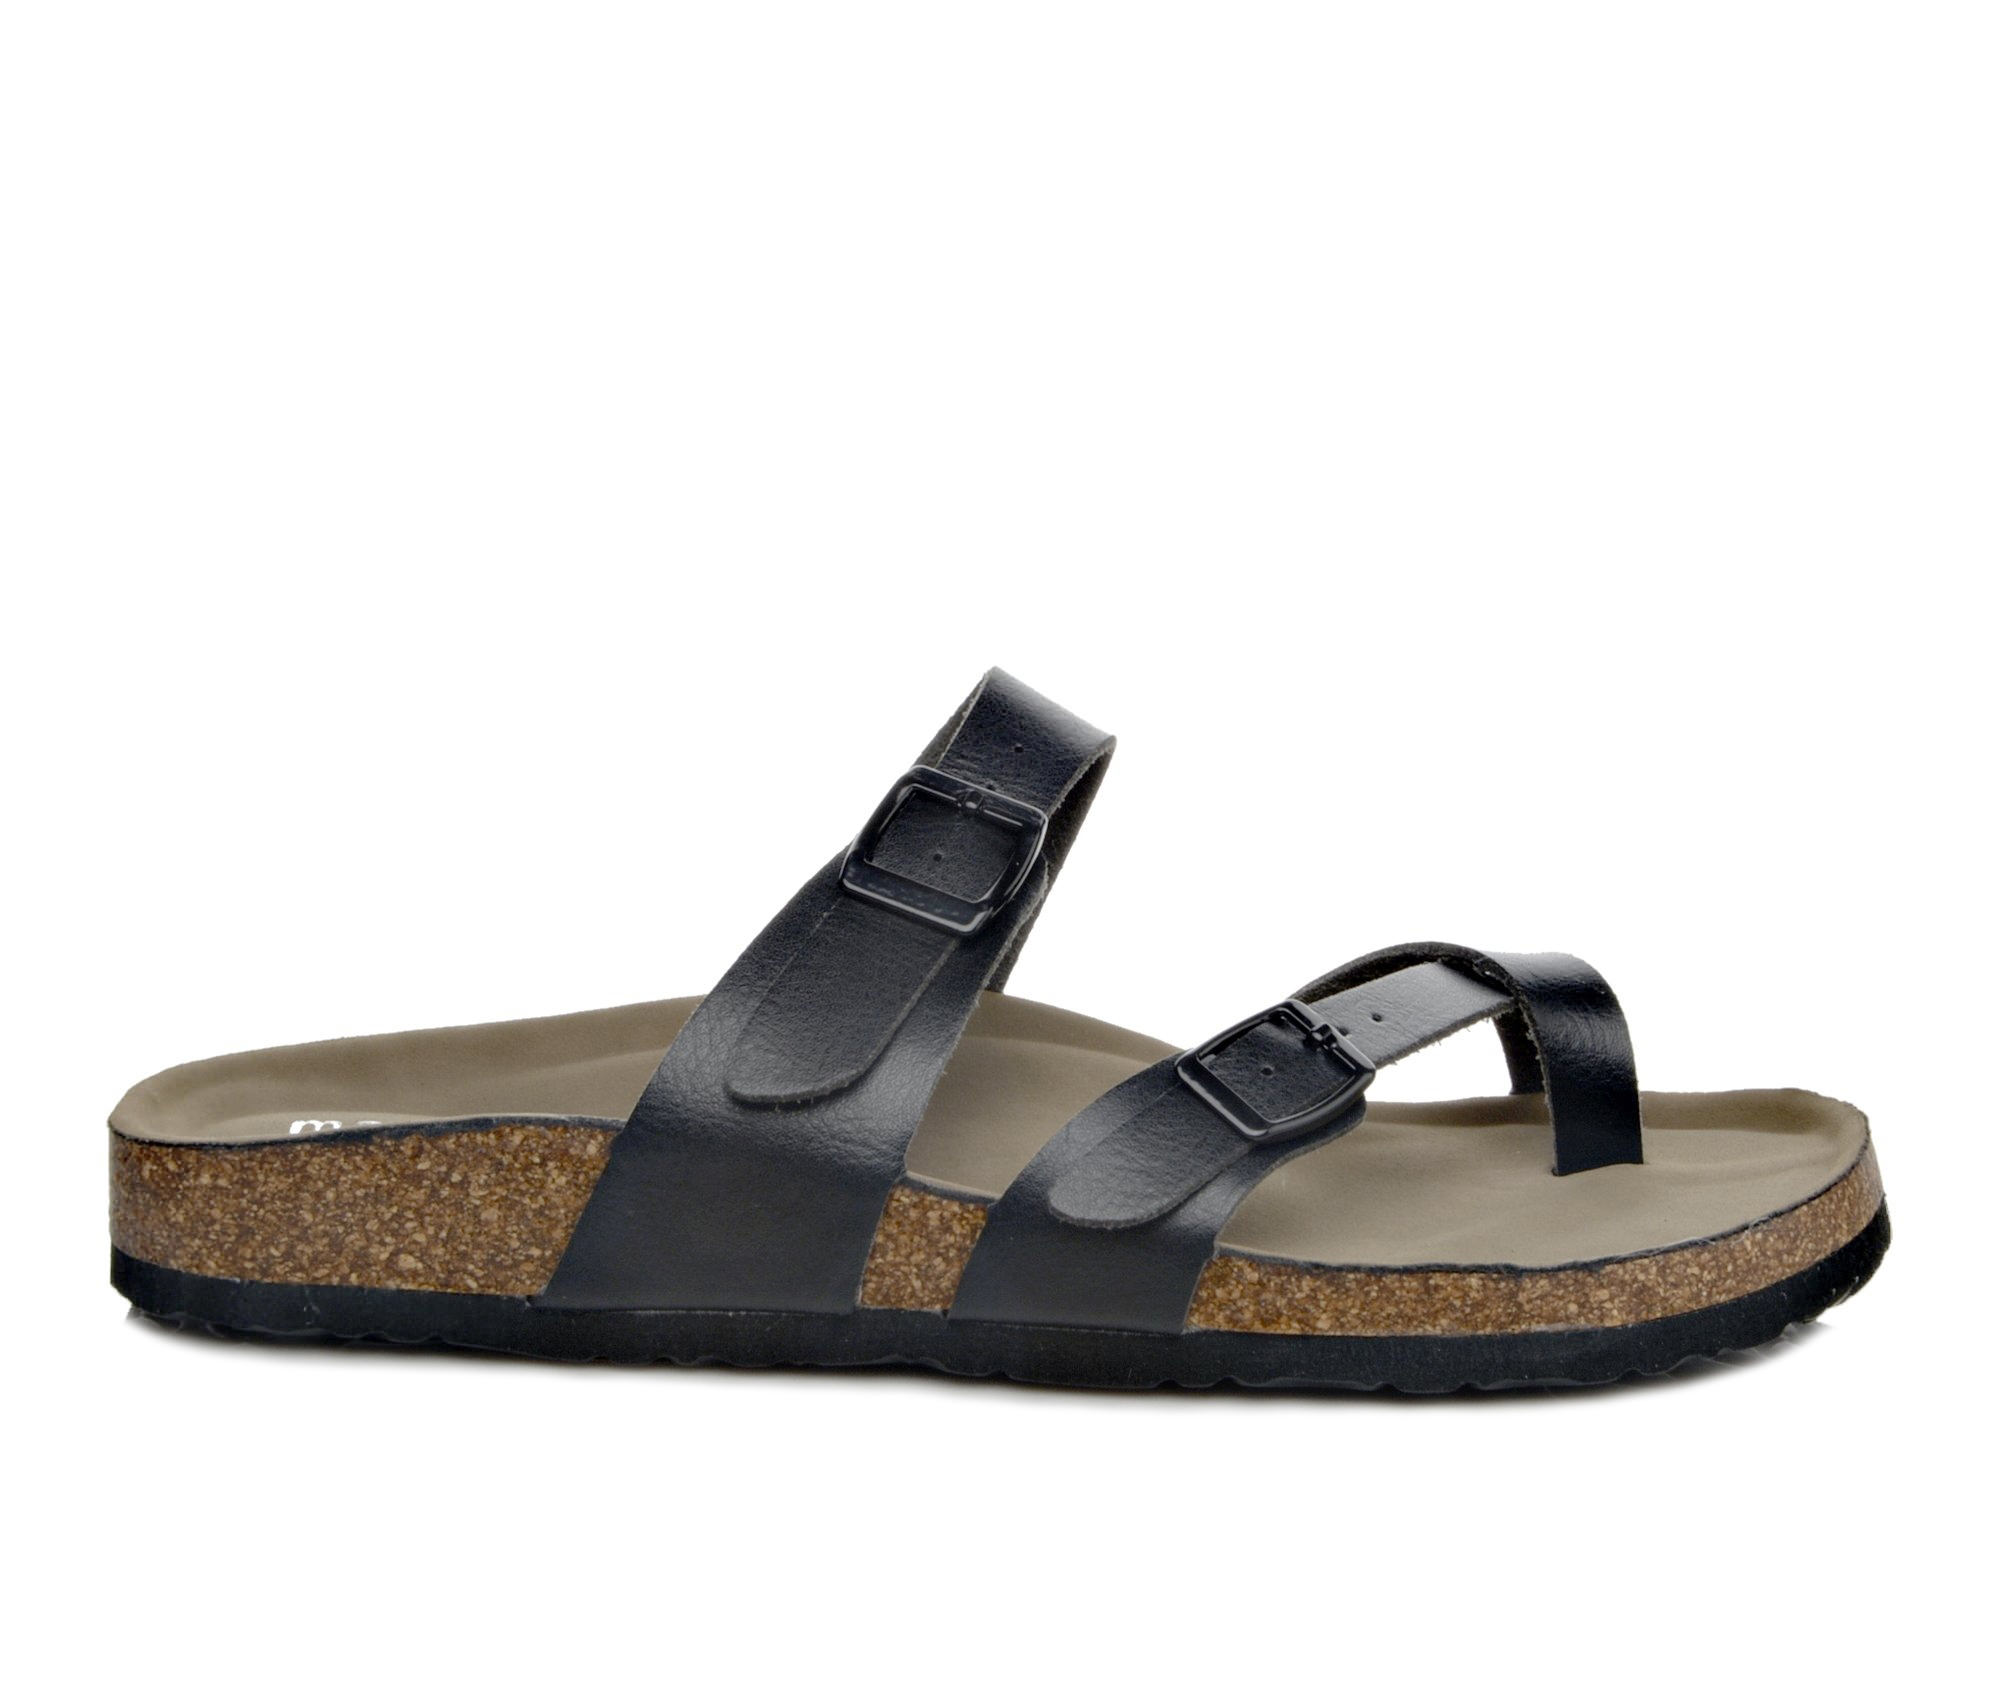 Madden Girl Bryceee Women's Sandal (Black Faux Leather)